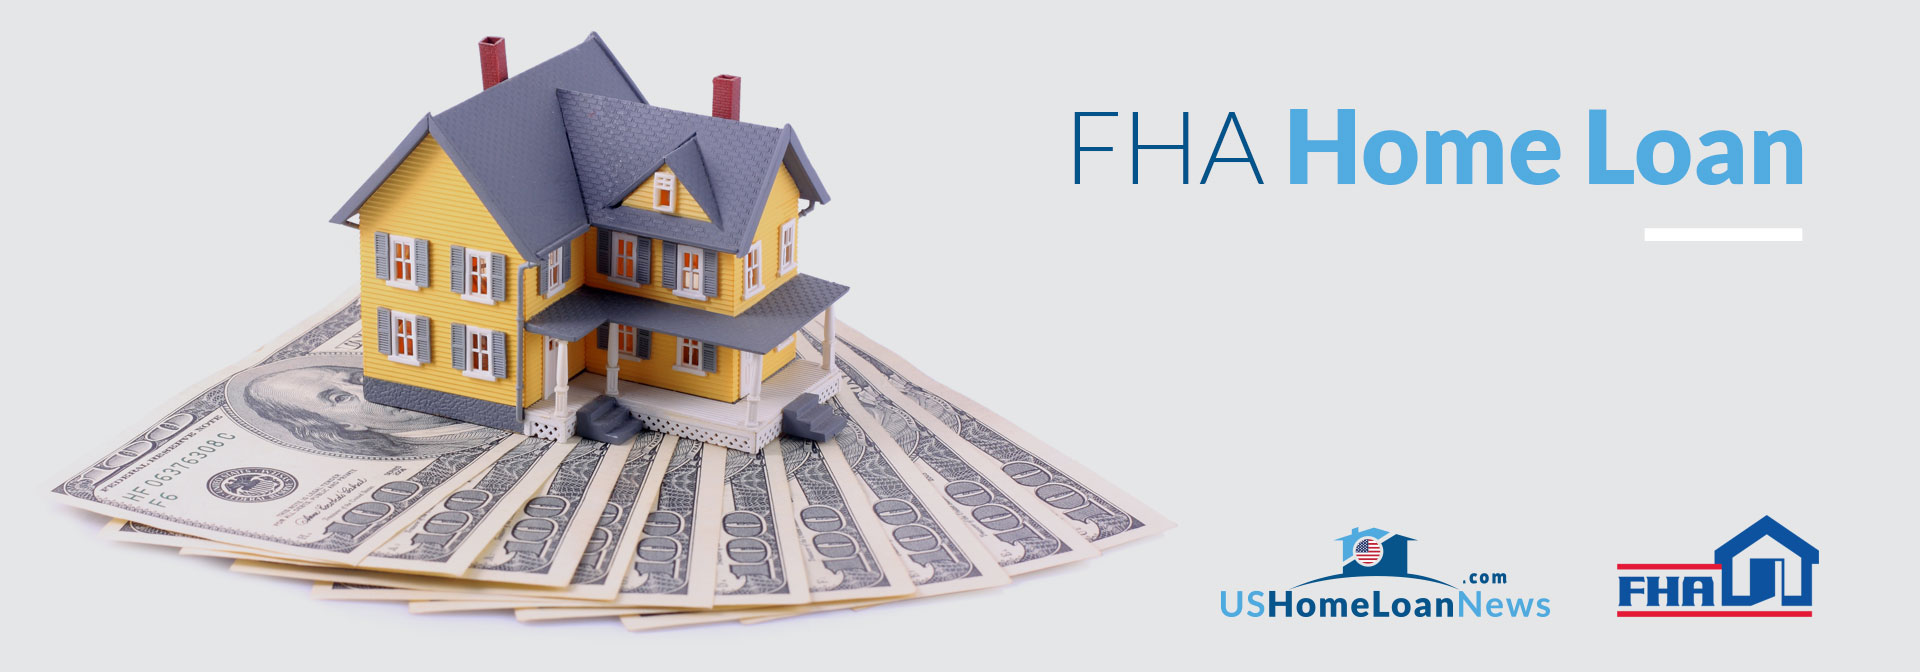 FHA Home Loan from US Home Loan News